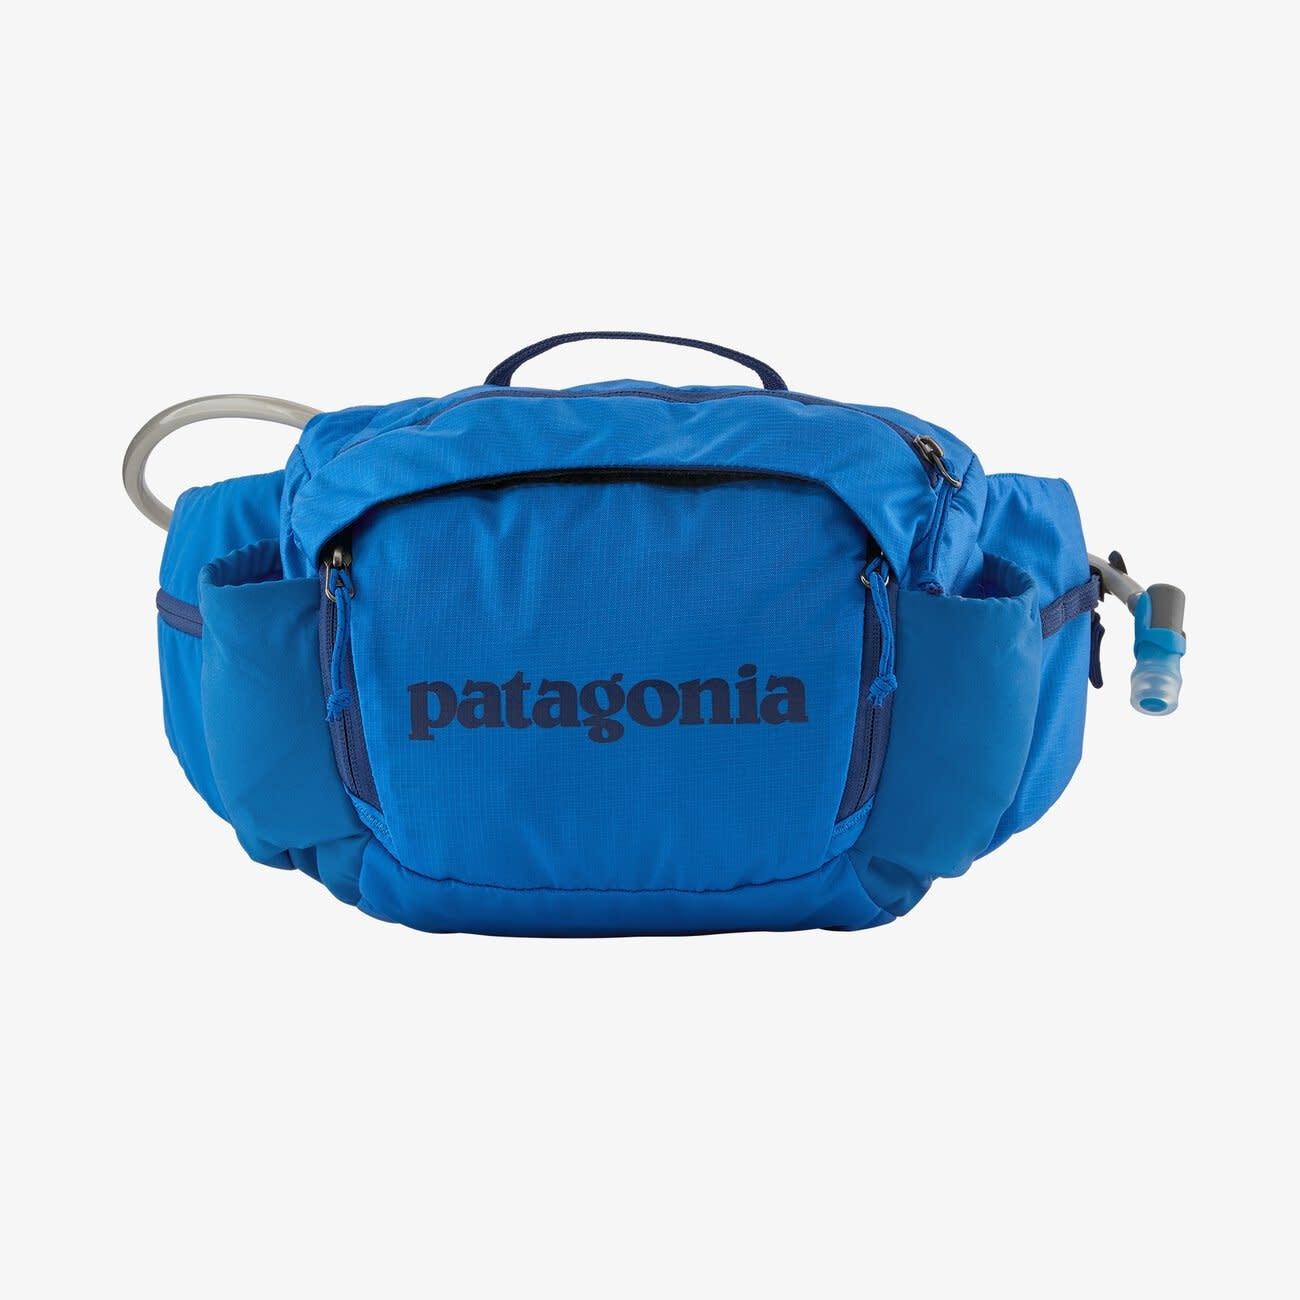 Patagonia Patagonia Nine Trails Waist Pack 8L